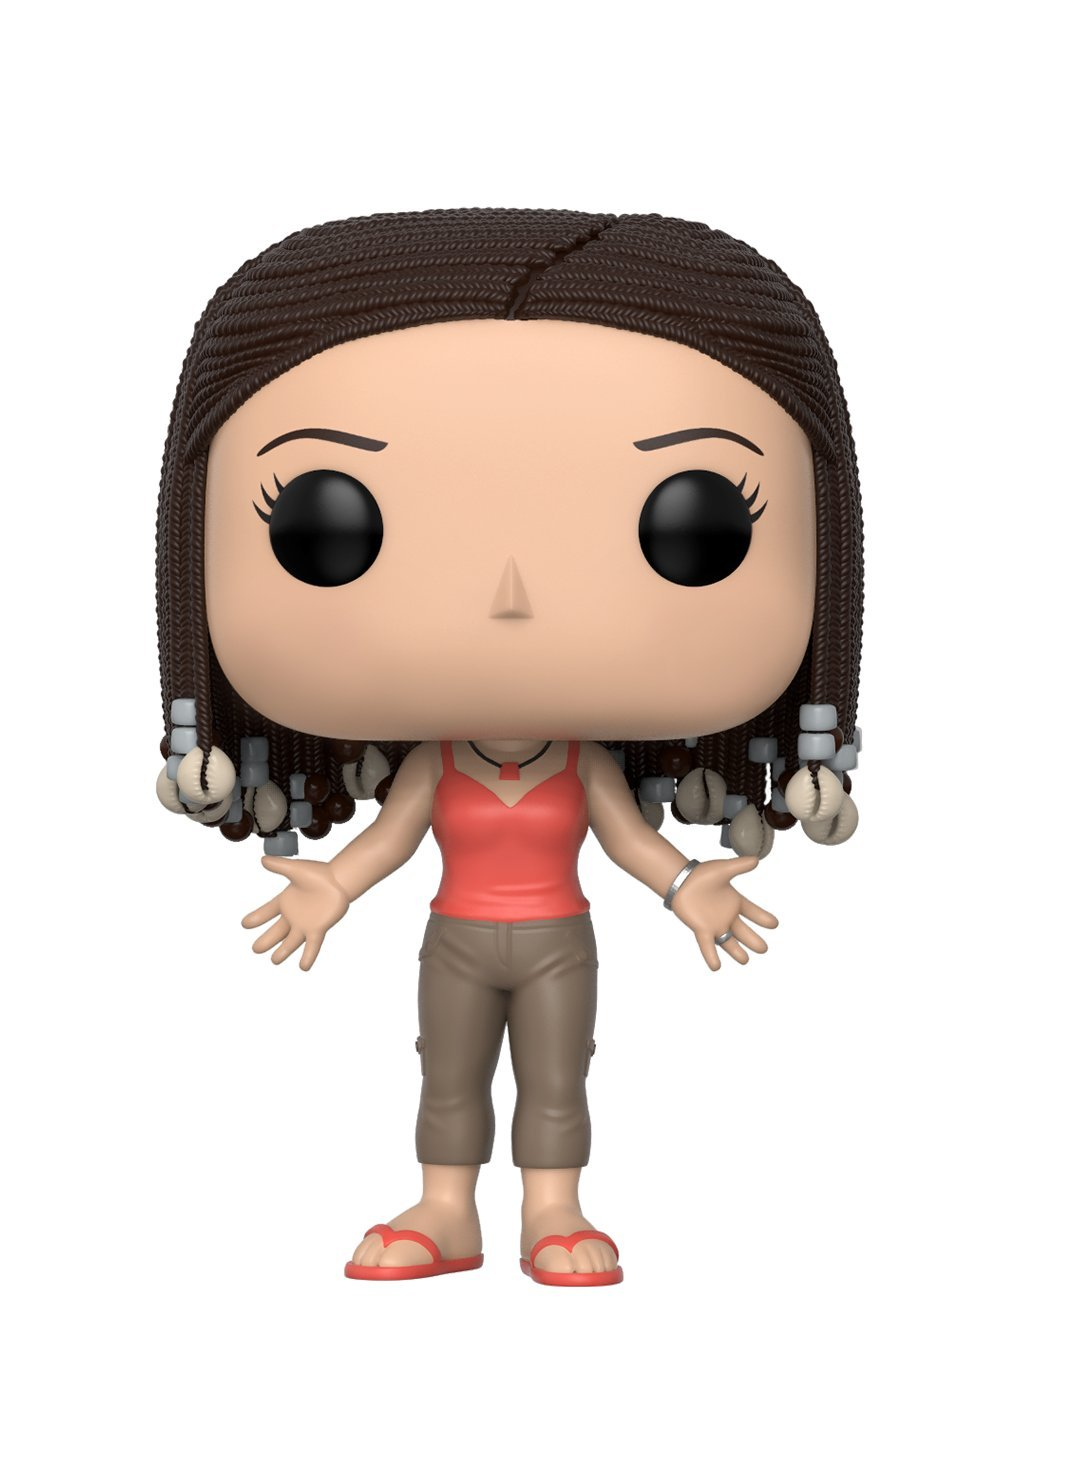 ویکالا · خرید  اصل اورجینال · خرید از آمازون · Funko Pop Television: Friends - Monica (Styles May Vary) Collectible Figure, Multicolor wekala · ویکالا